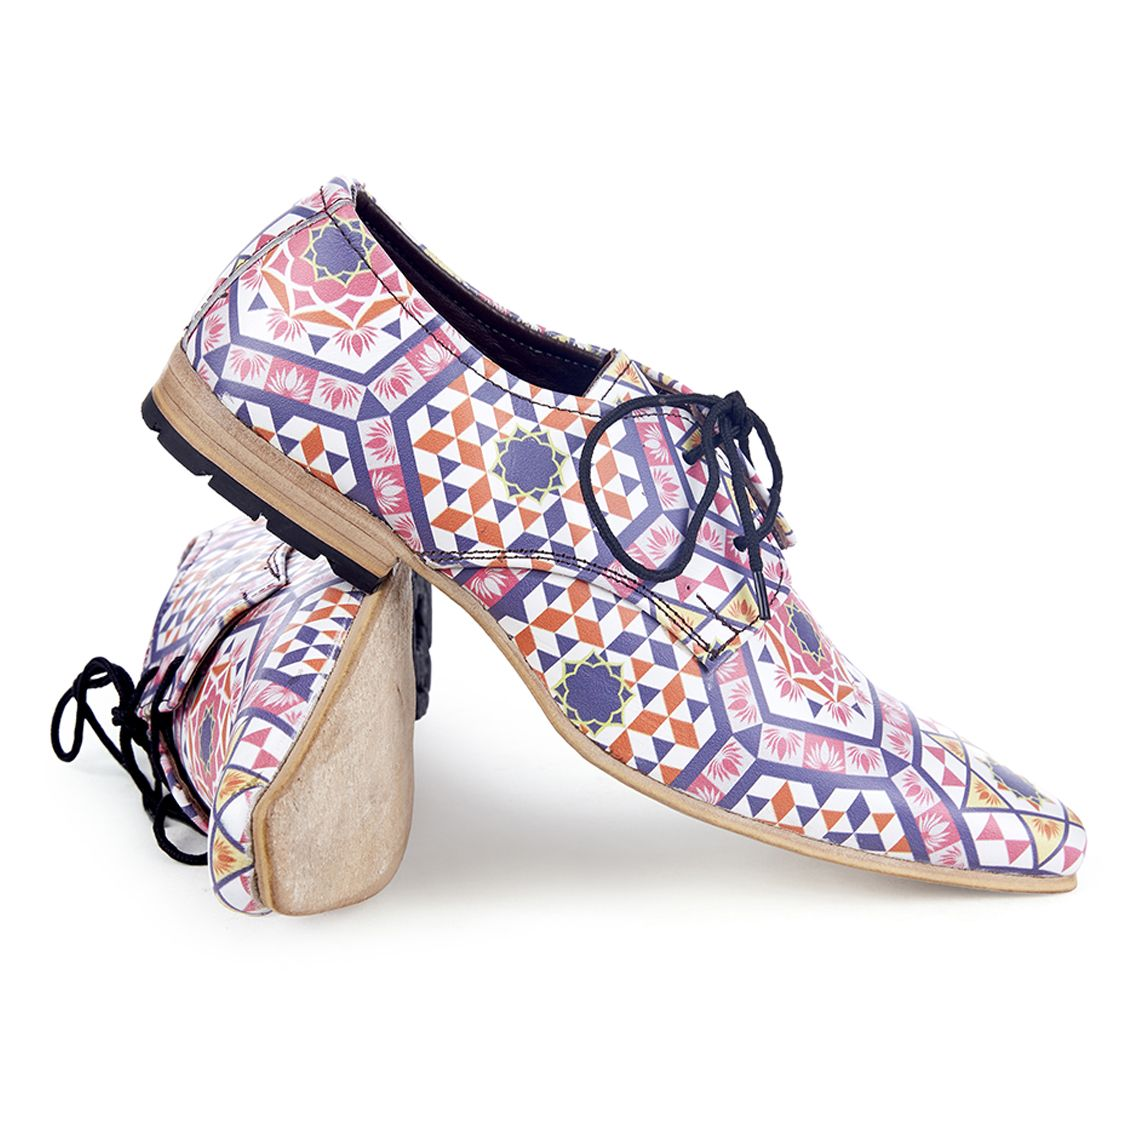 Kanwal Lotus Handmade Printed Shoes